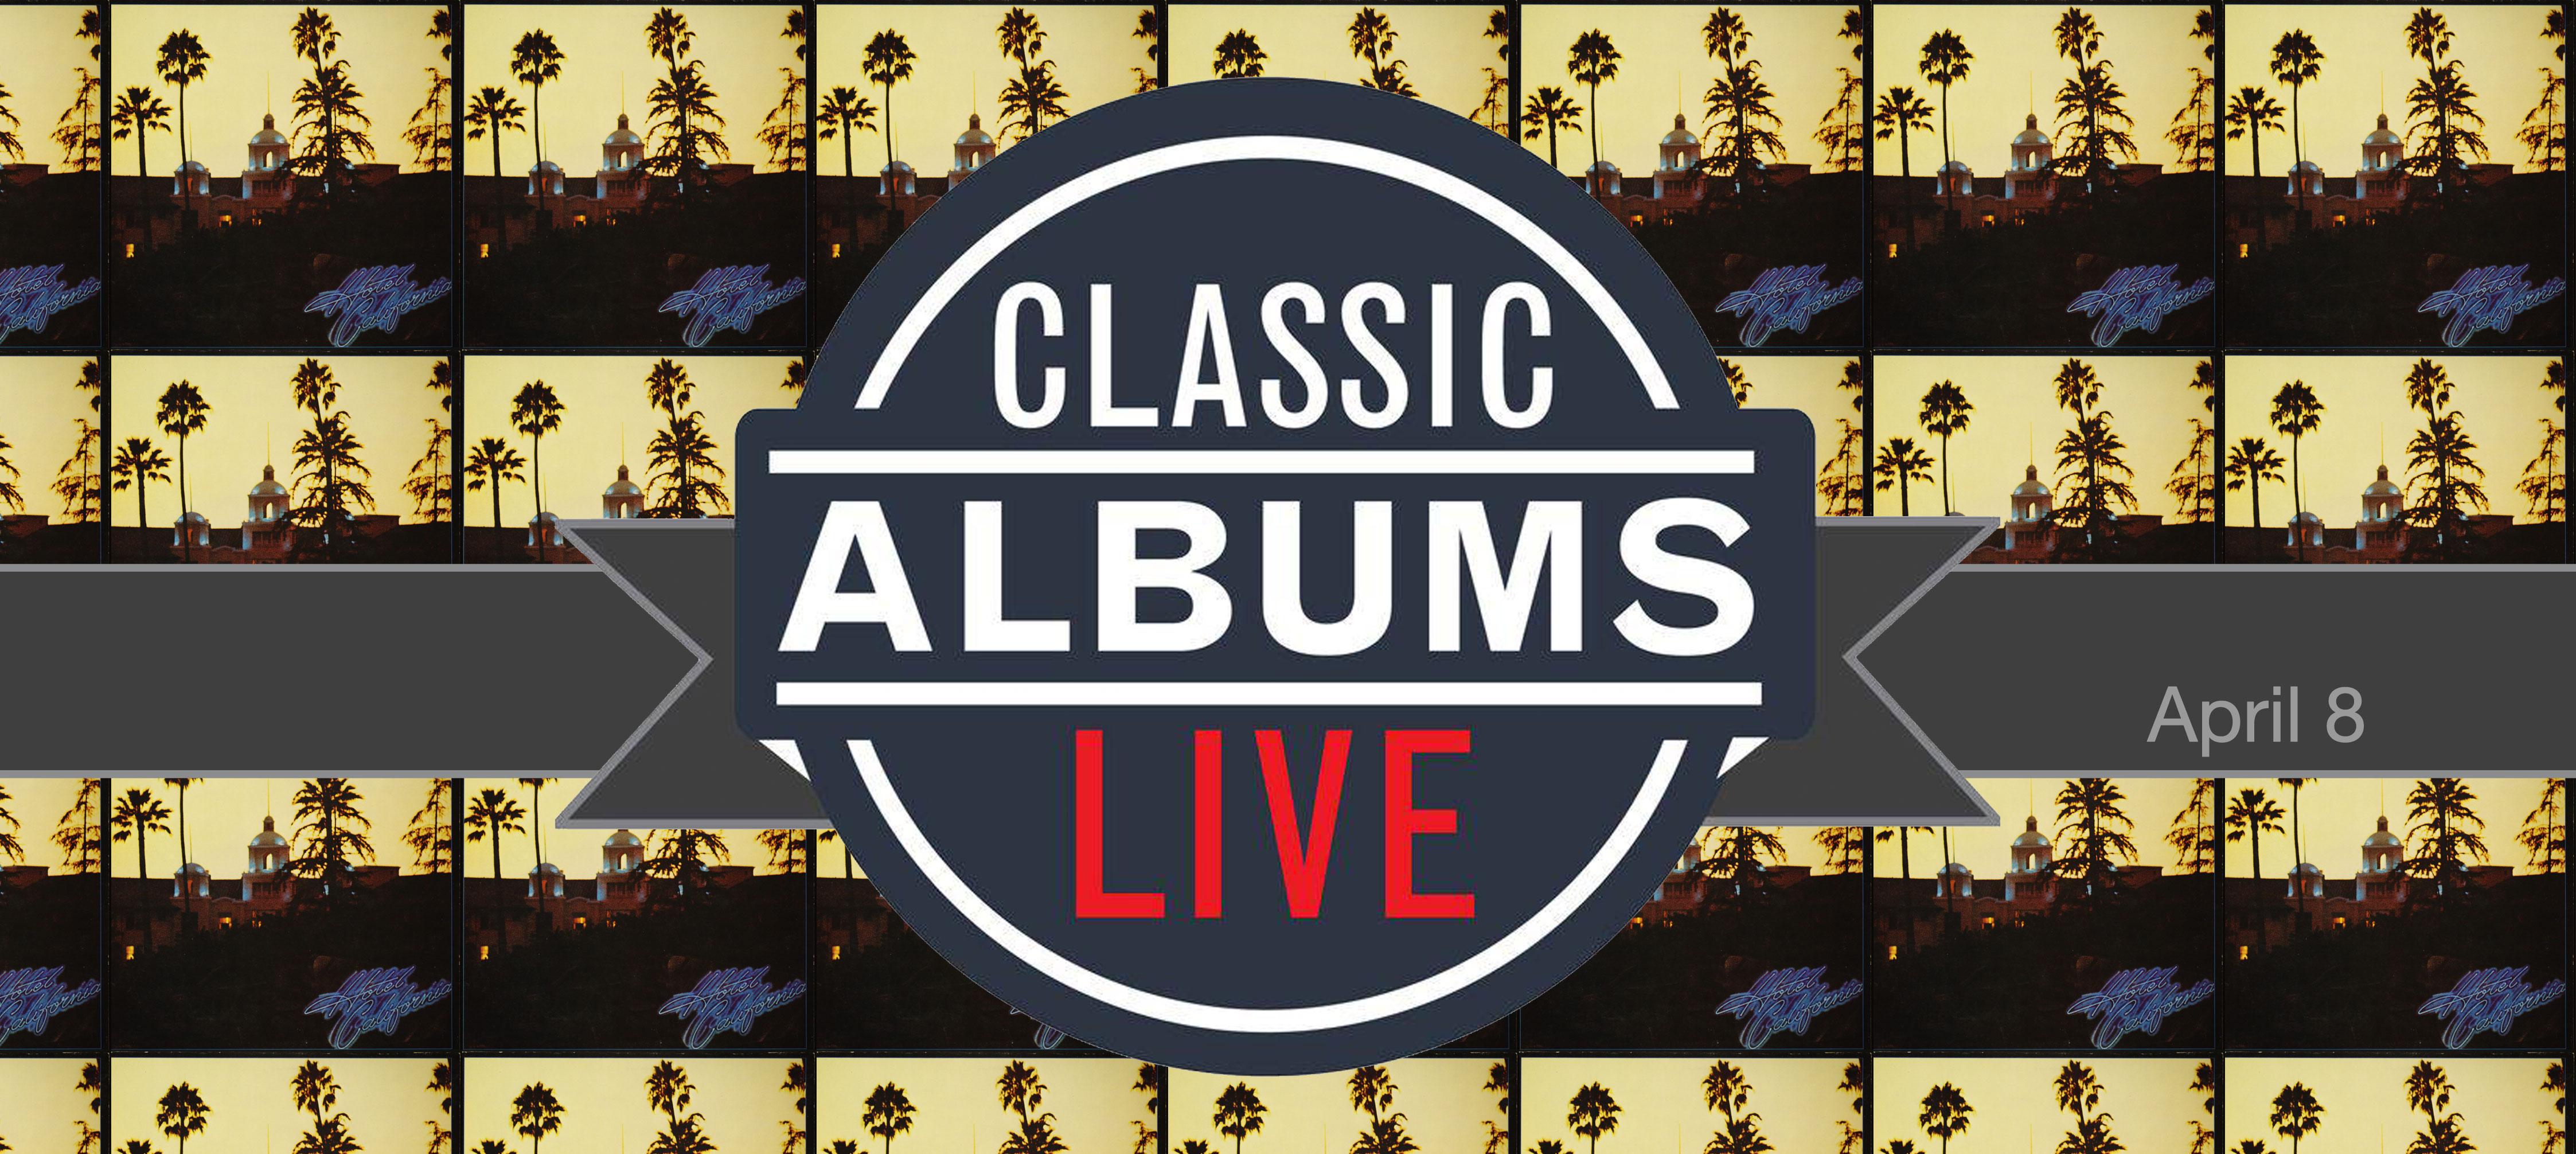 Classic Albums Live Presents: The Eagles - Hotel California - Uptown Saint  John